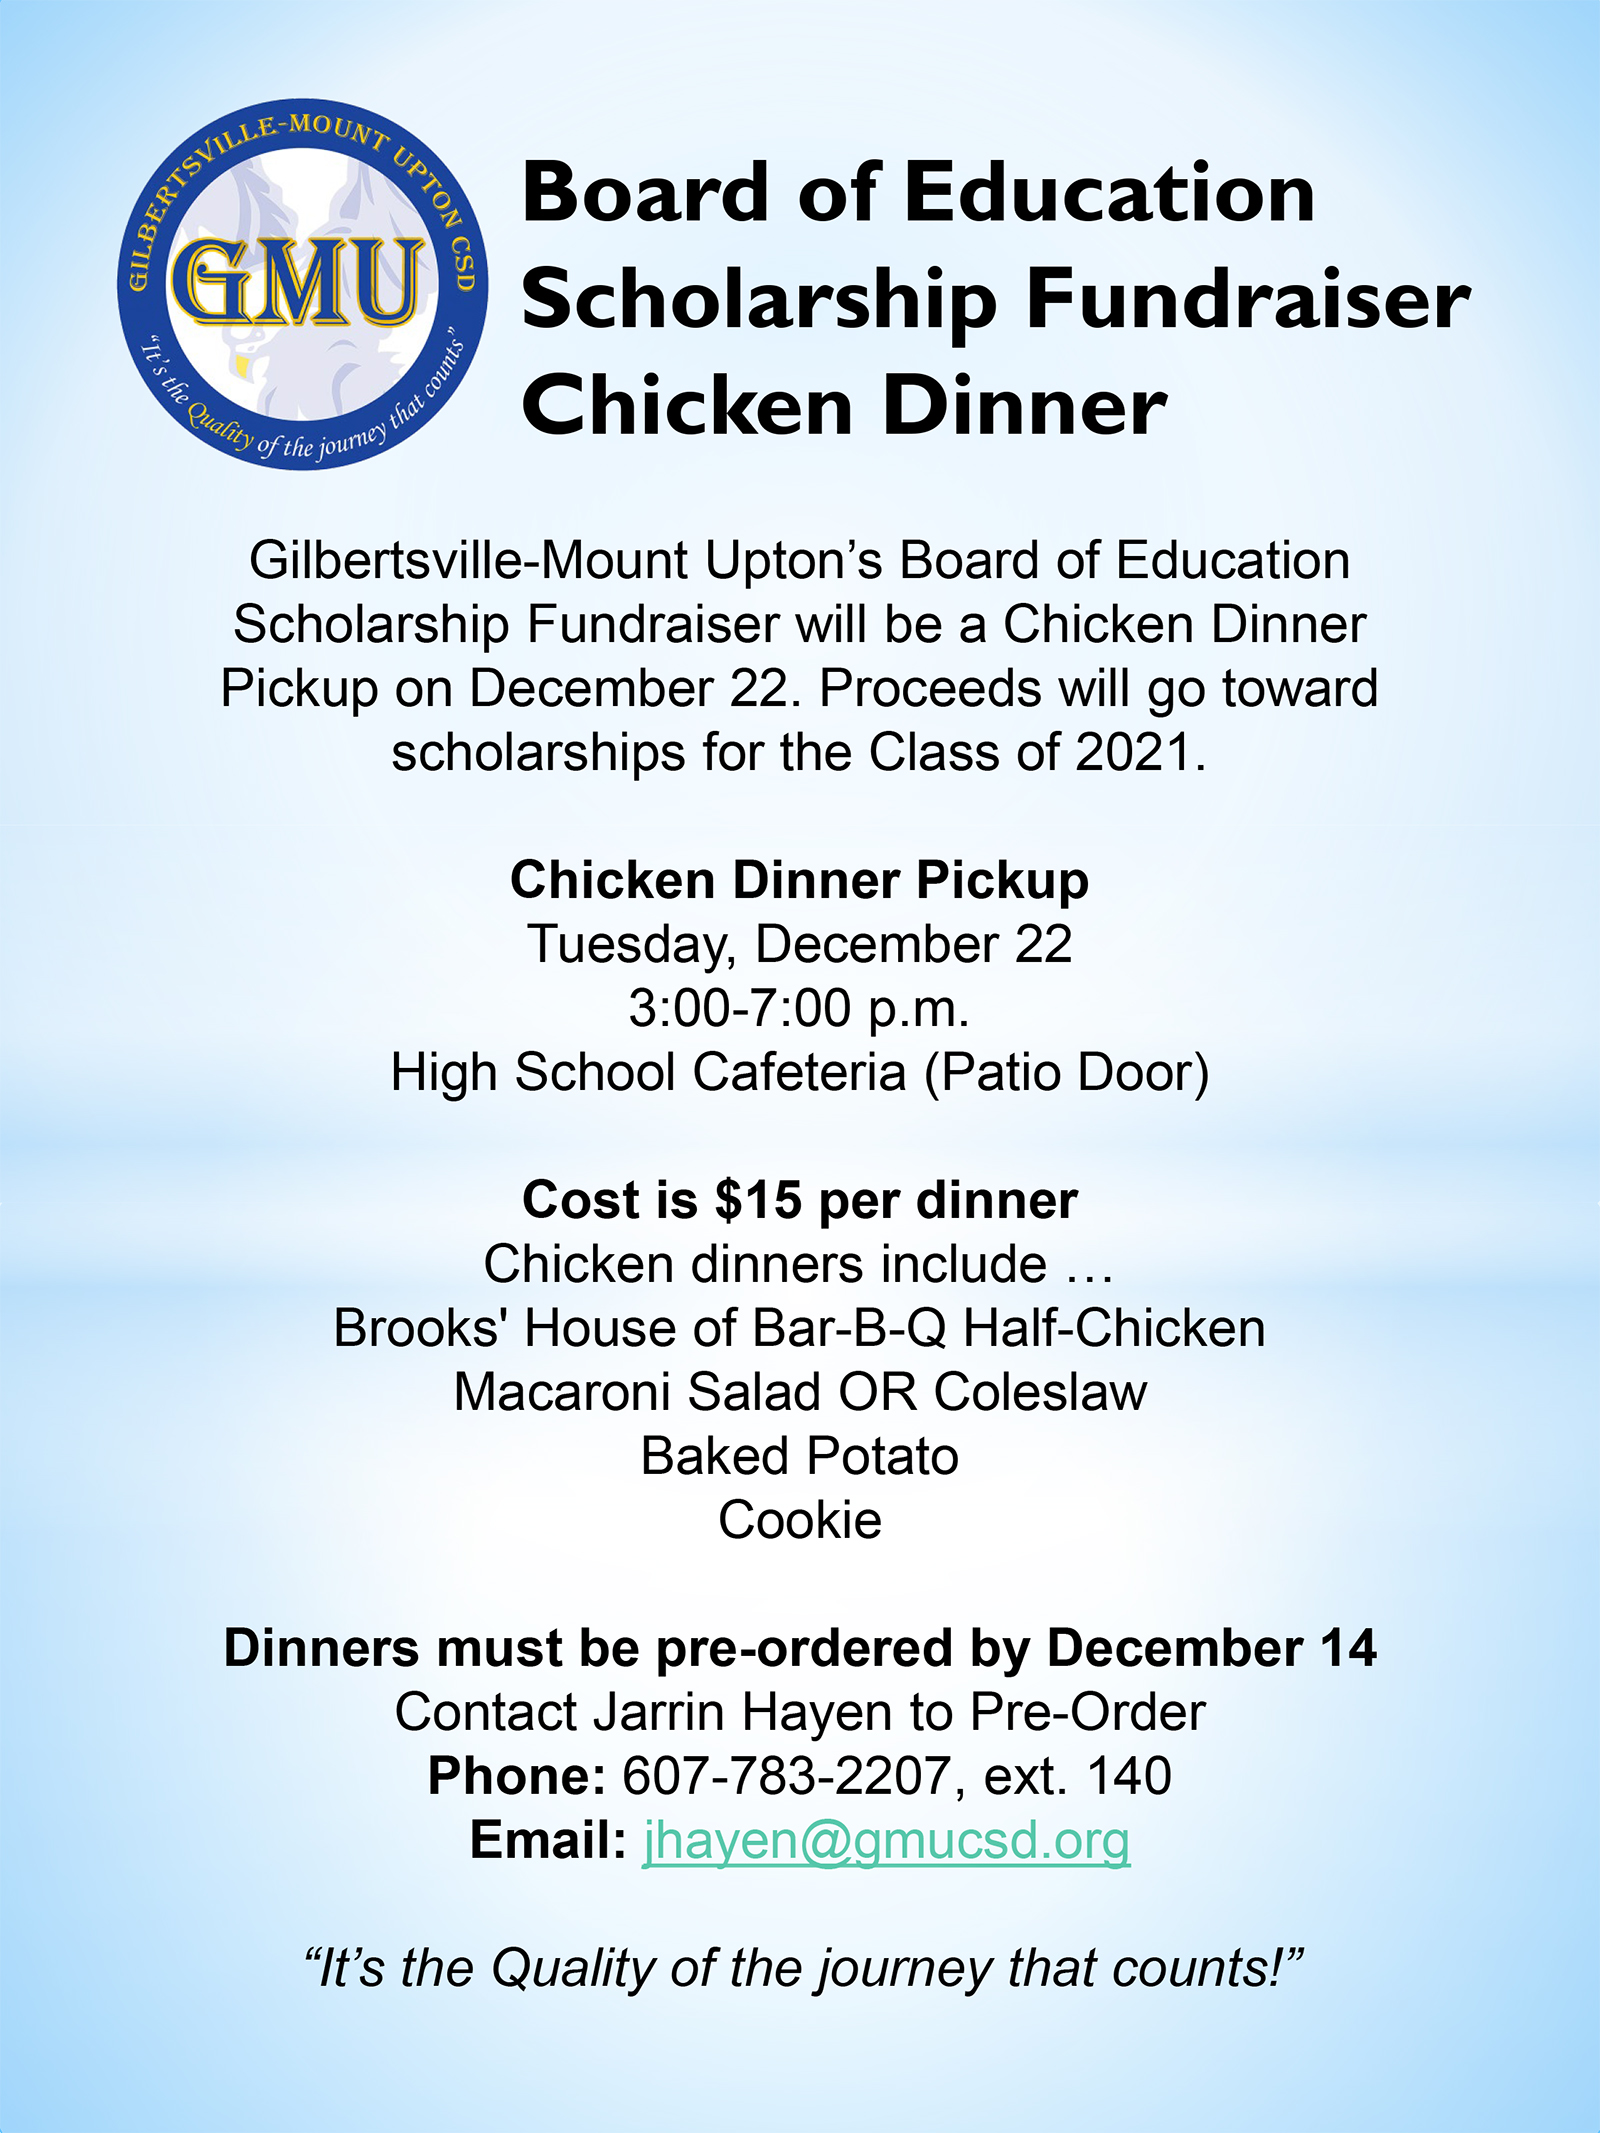 Chicken Fundraiser Flyer (11/2020)